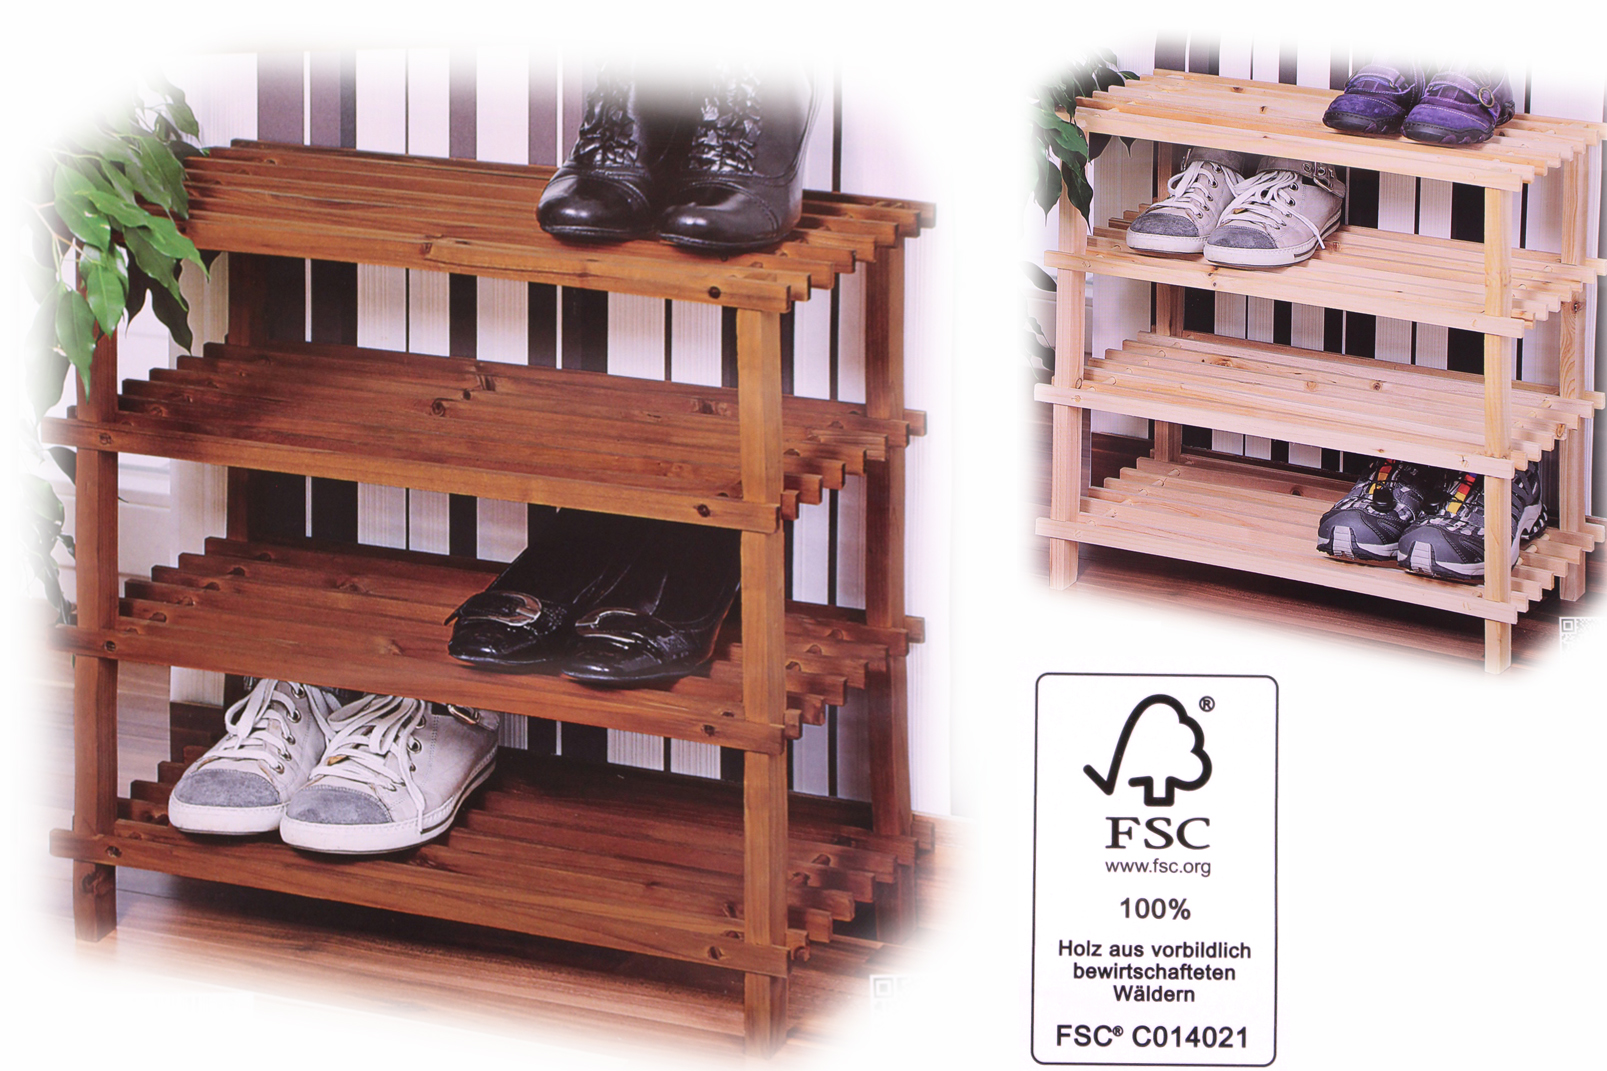 kesper fsc natur holz schuhregal schuhschrank vierst ckig tanne regal b54xh52cm ebay. Black Bedroom Furniture Sets. Home Design Ideas